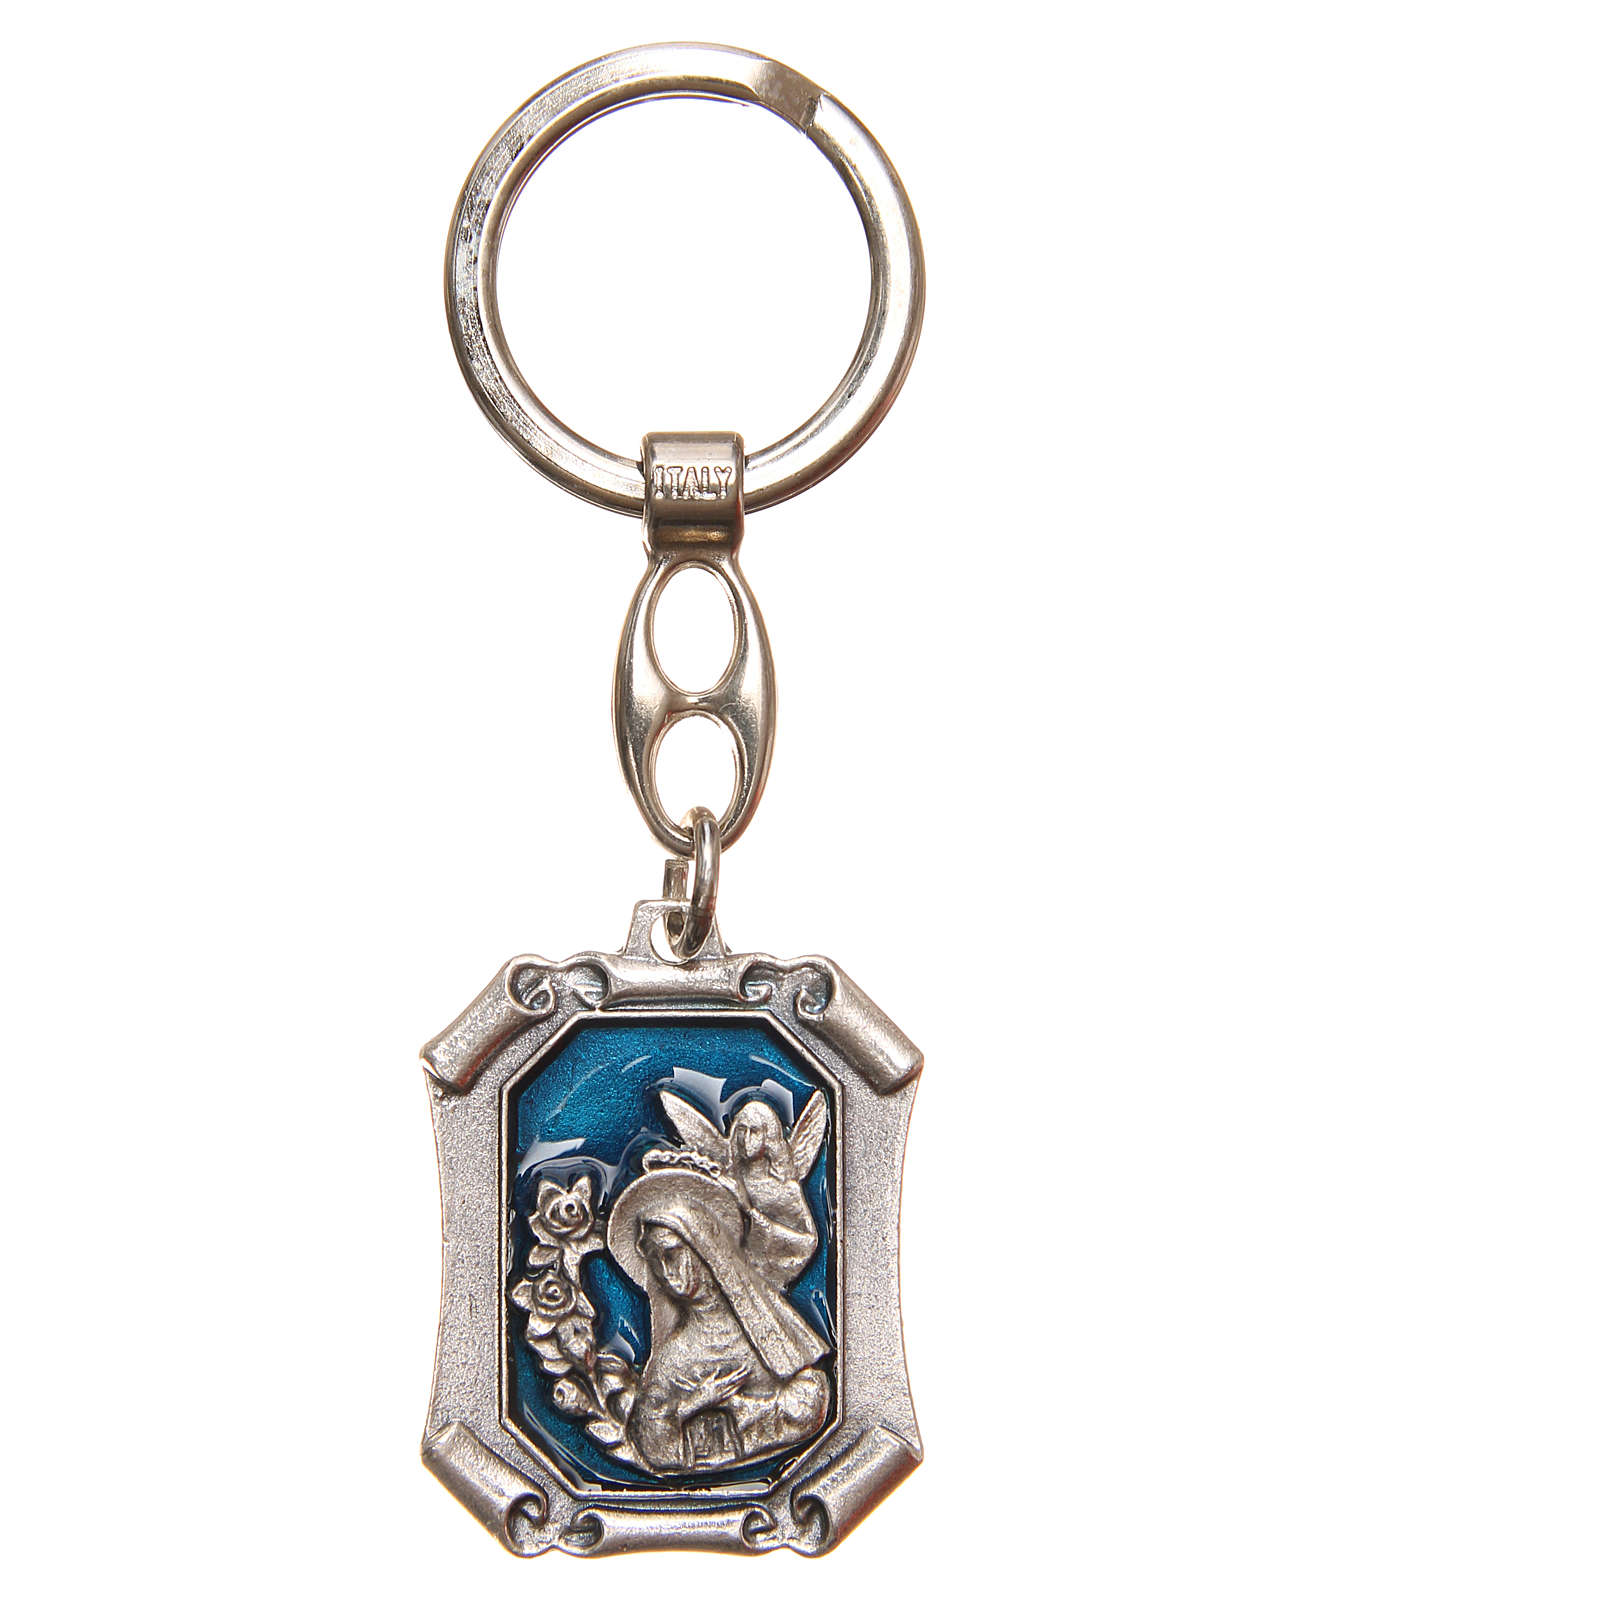 STOCK Key ring Saint Rita nickel-plated, blue enamel 3